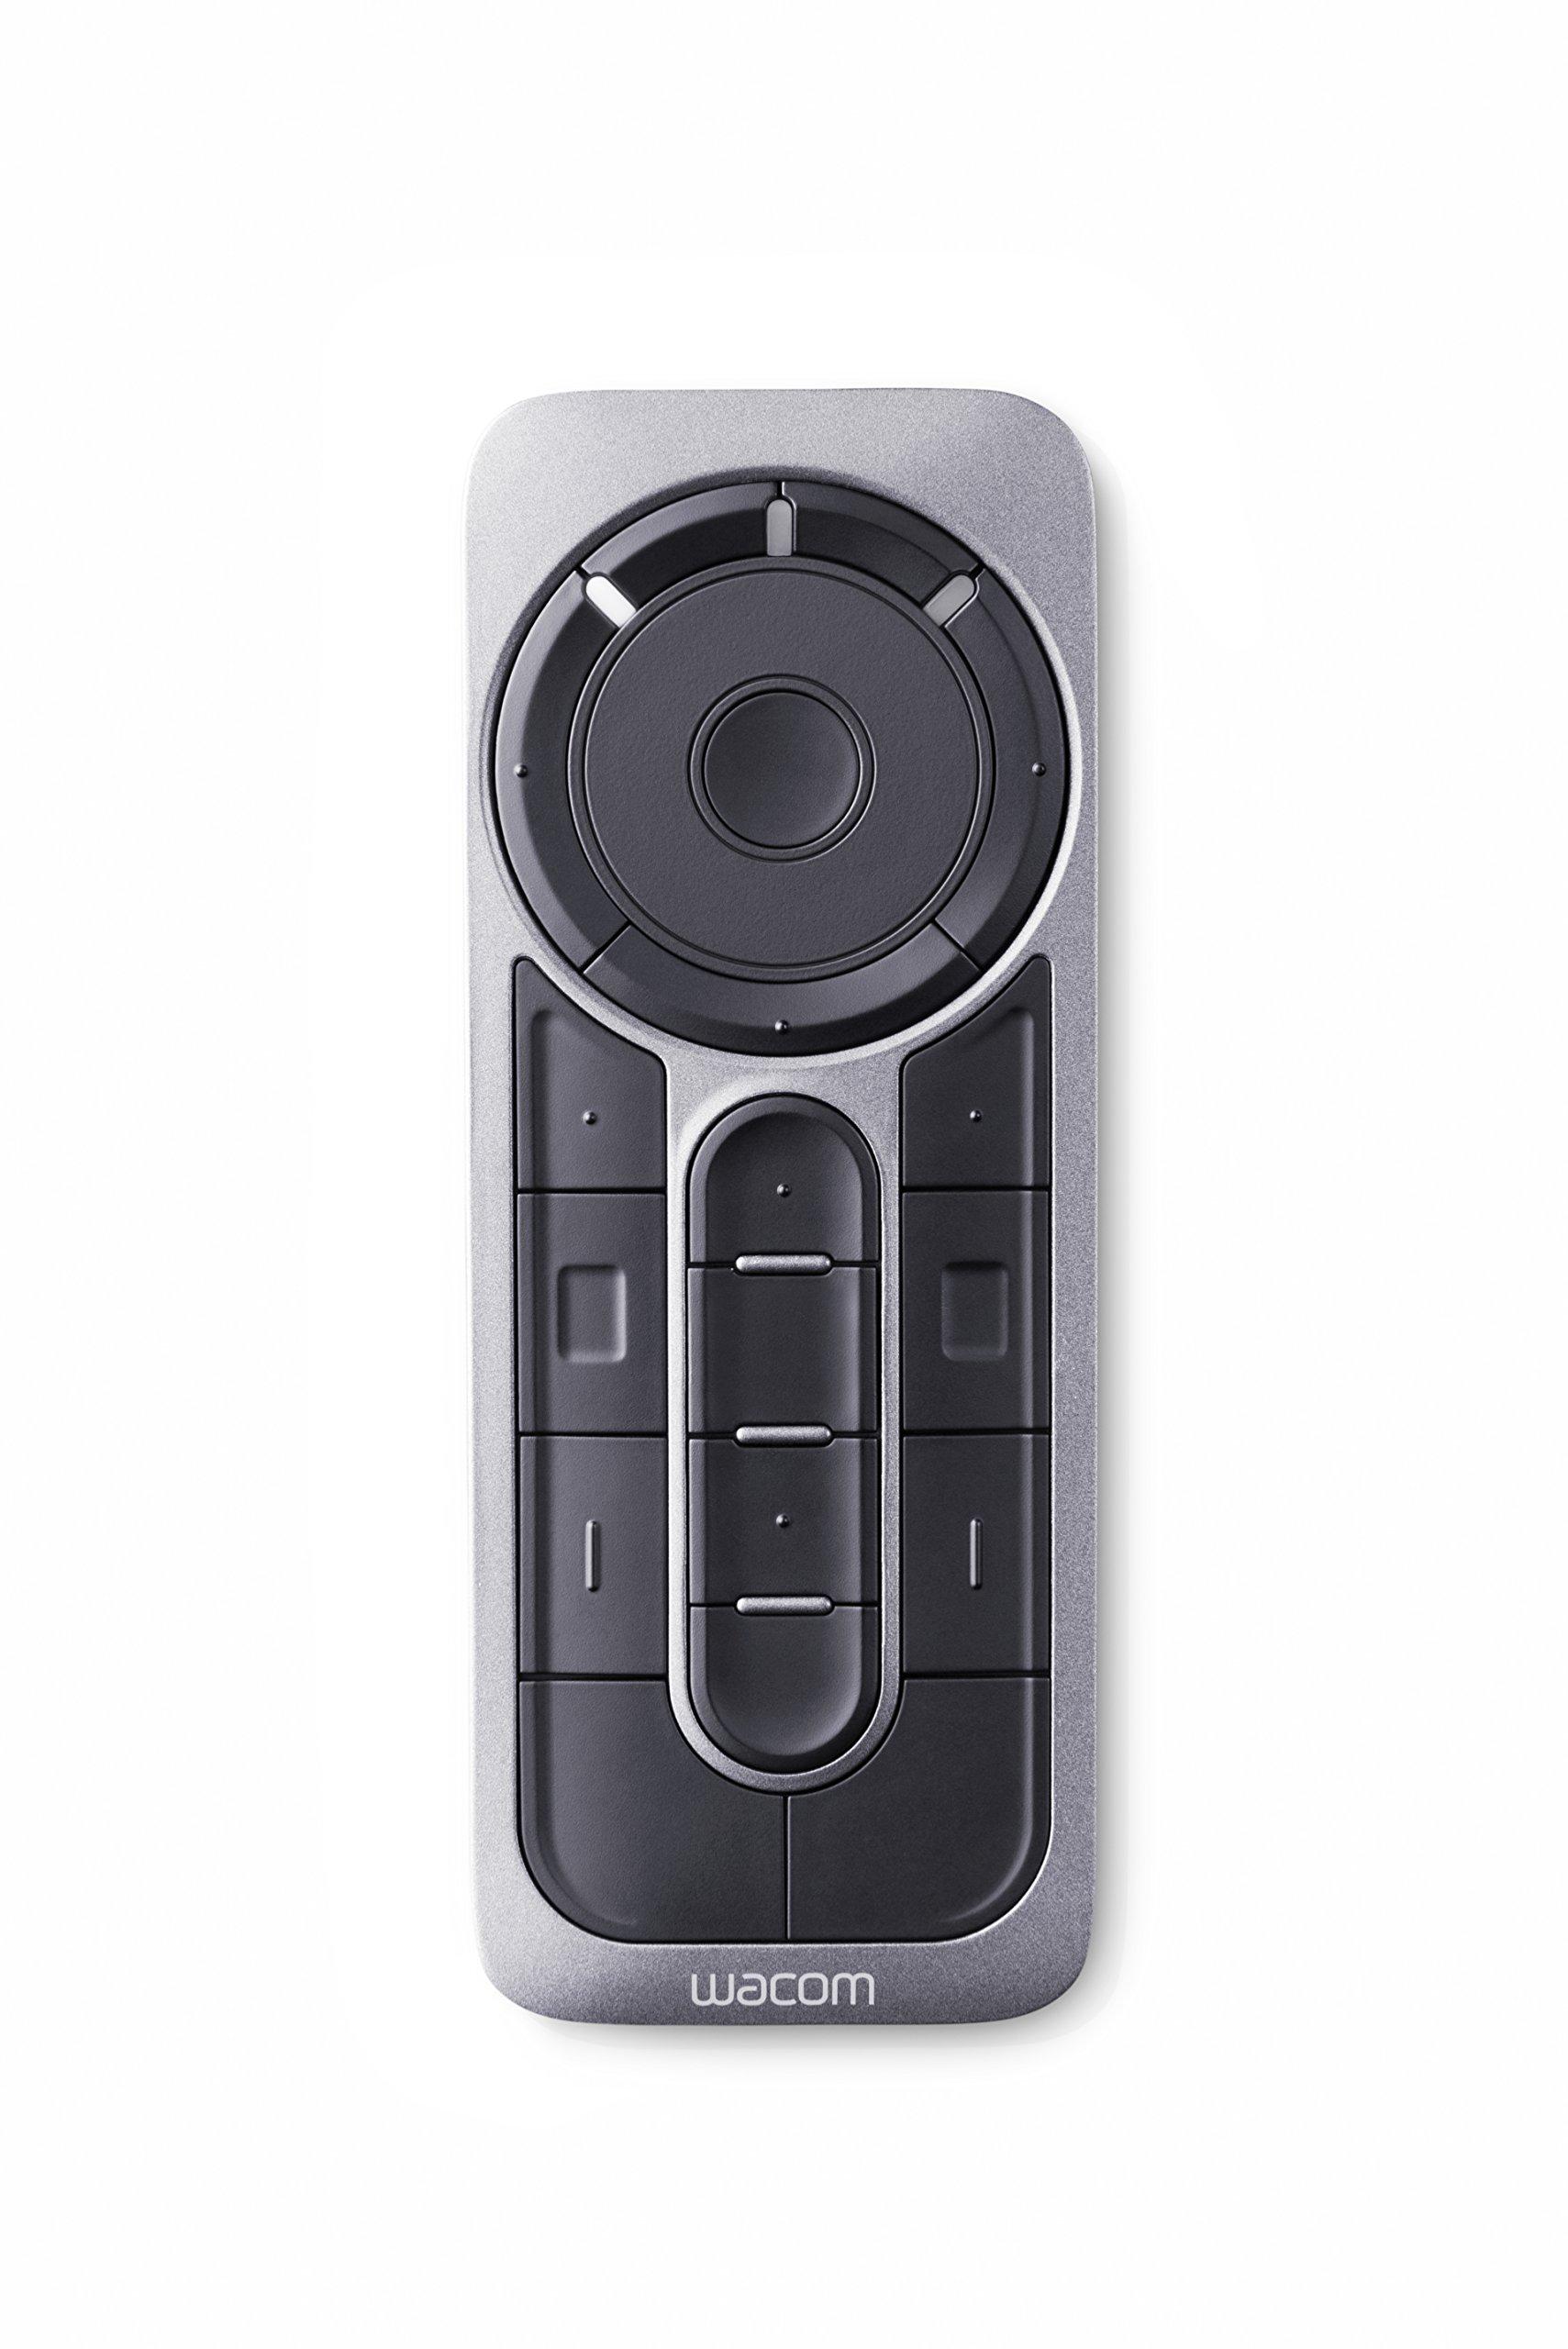 Wacom Express Key Remote for Cintiq & Intuos Pro (ACK411050)